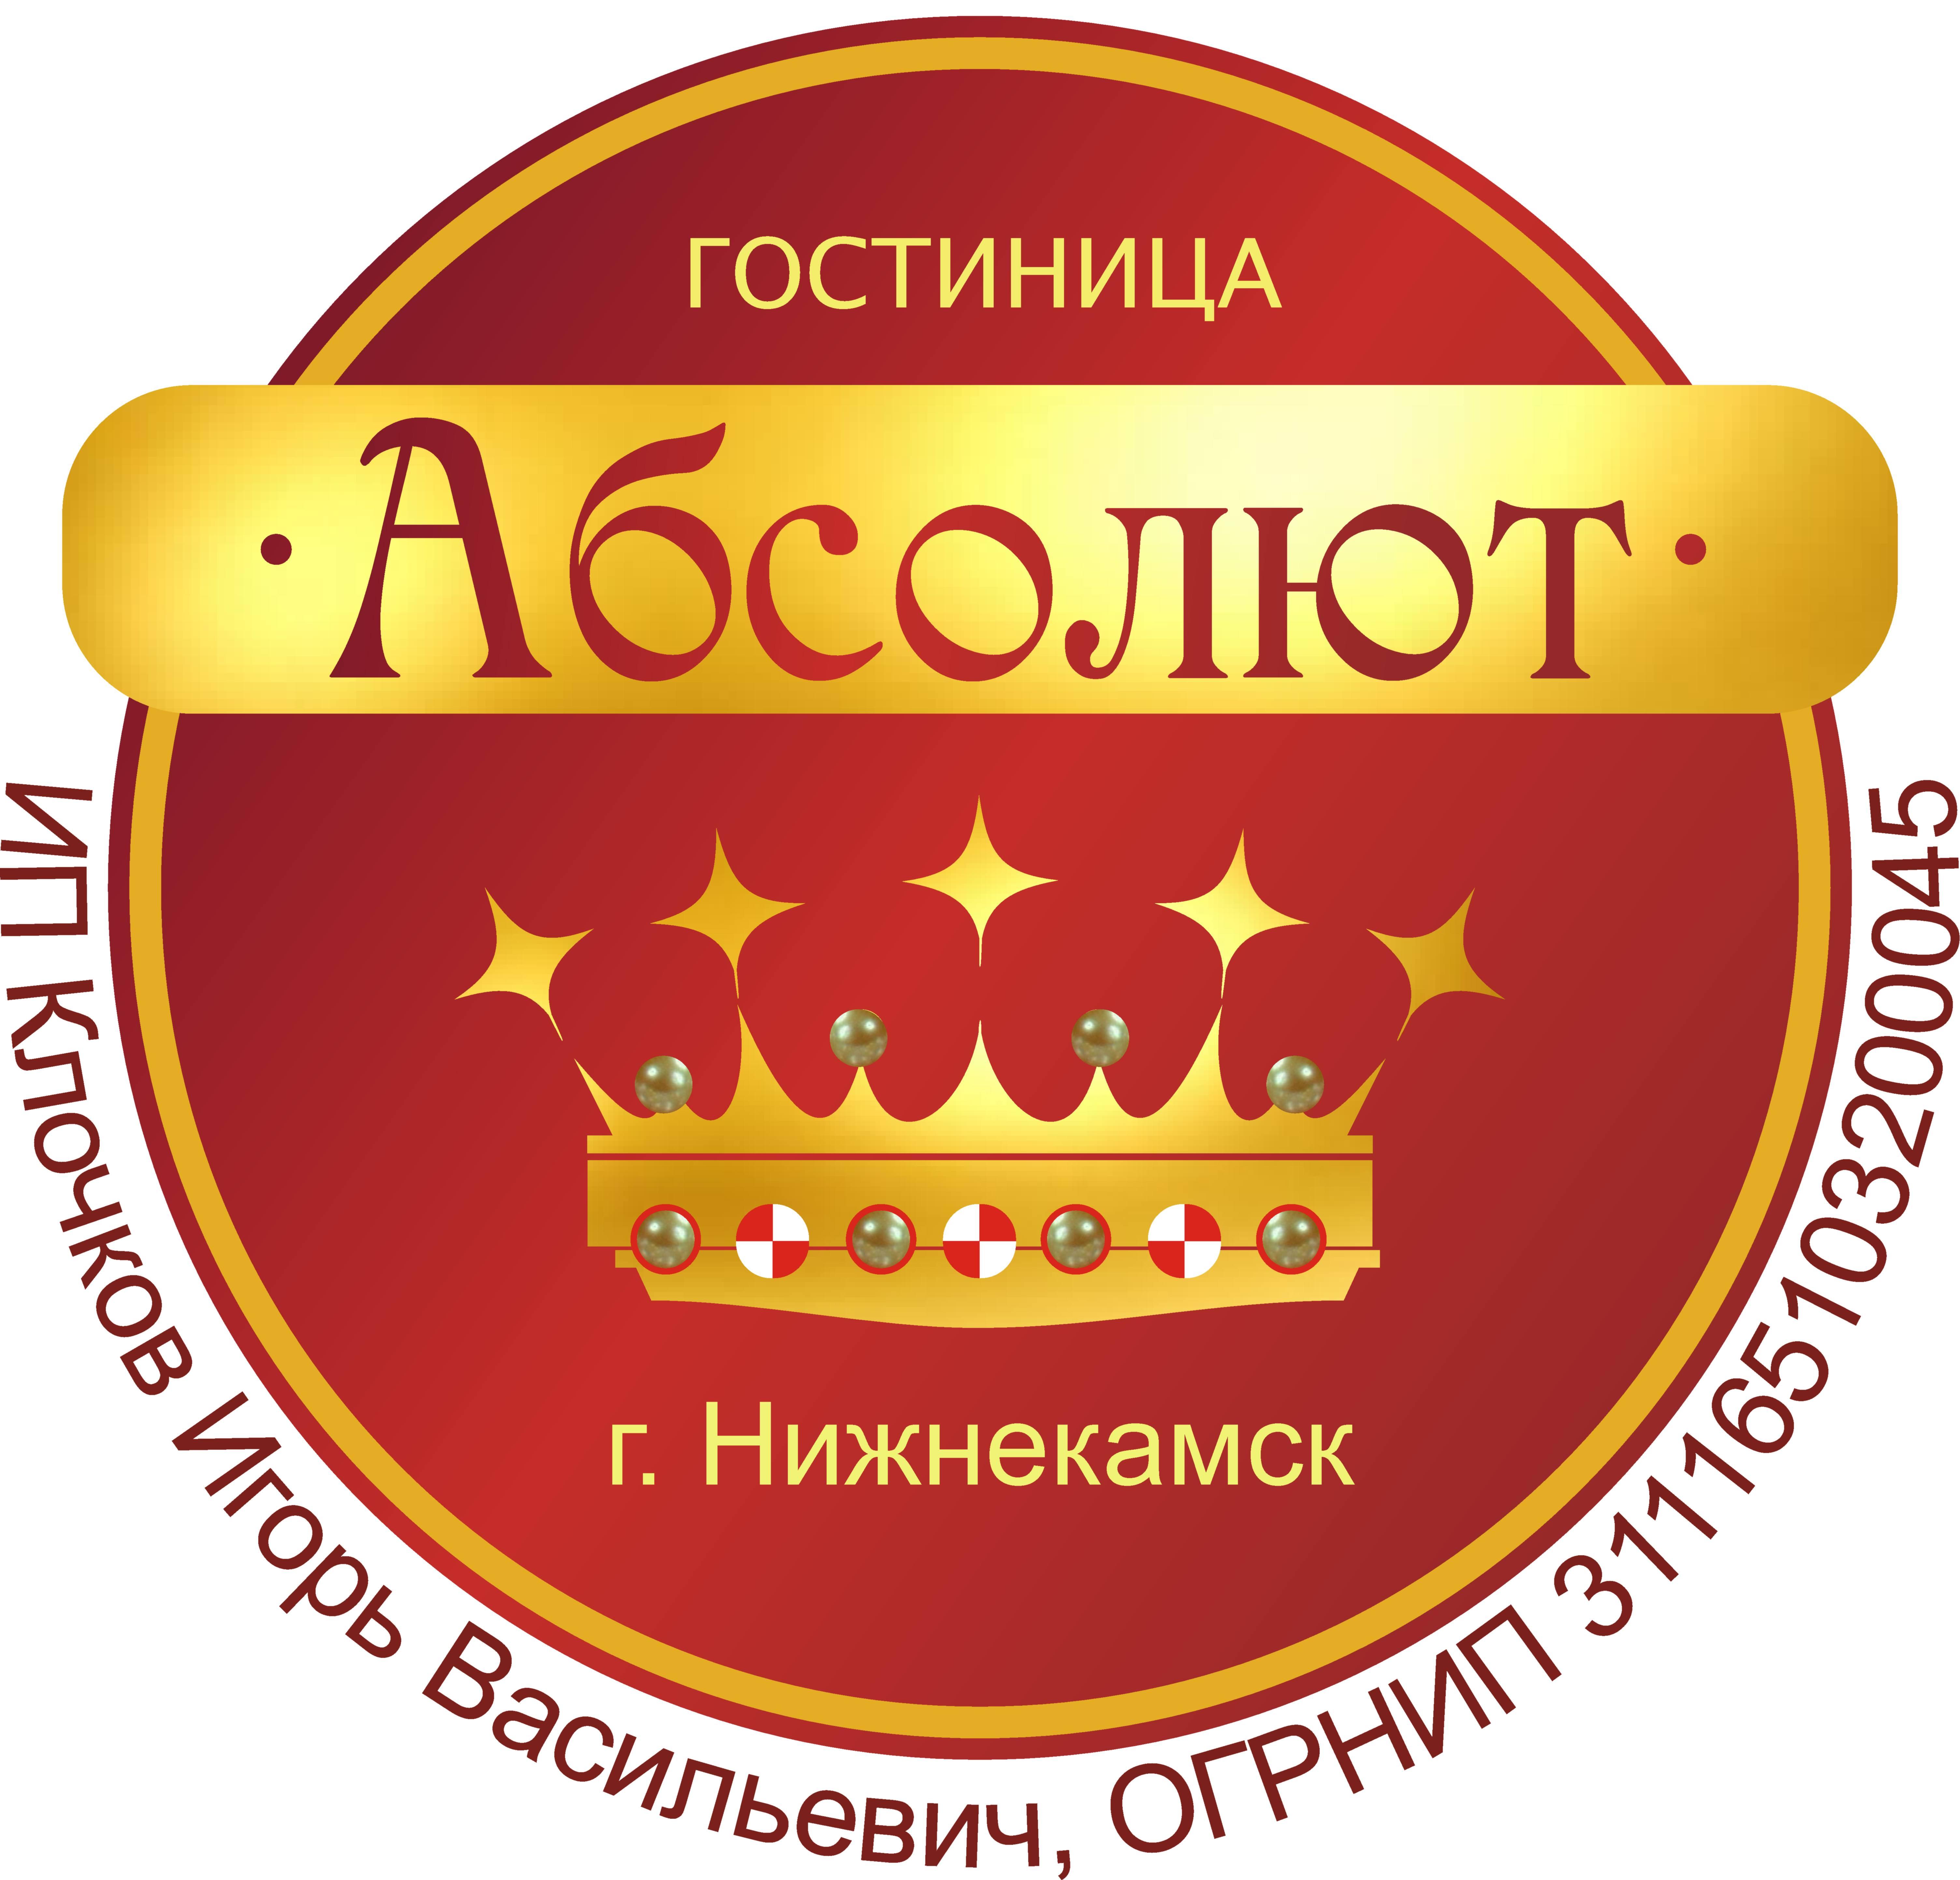 Логотип гостиницы Абсолют город Нижнекамск